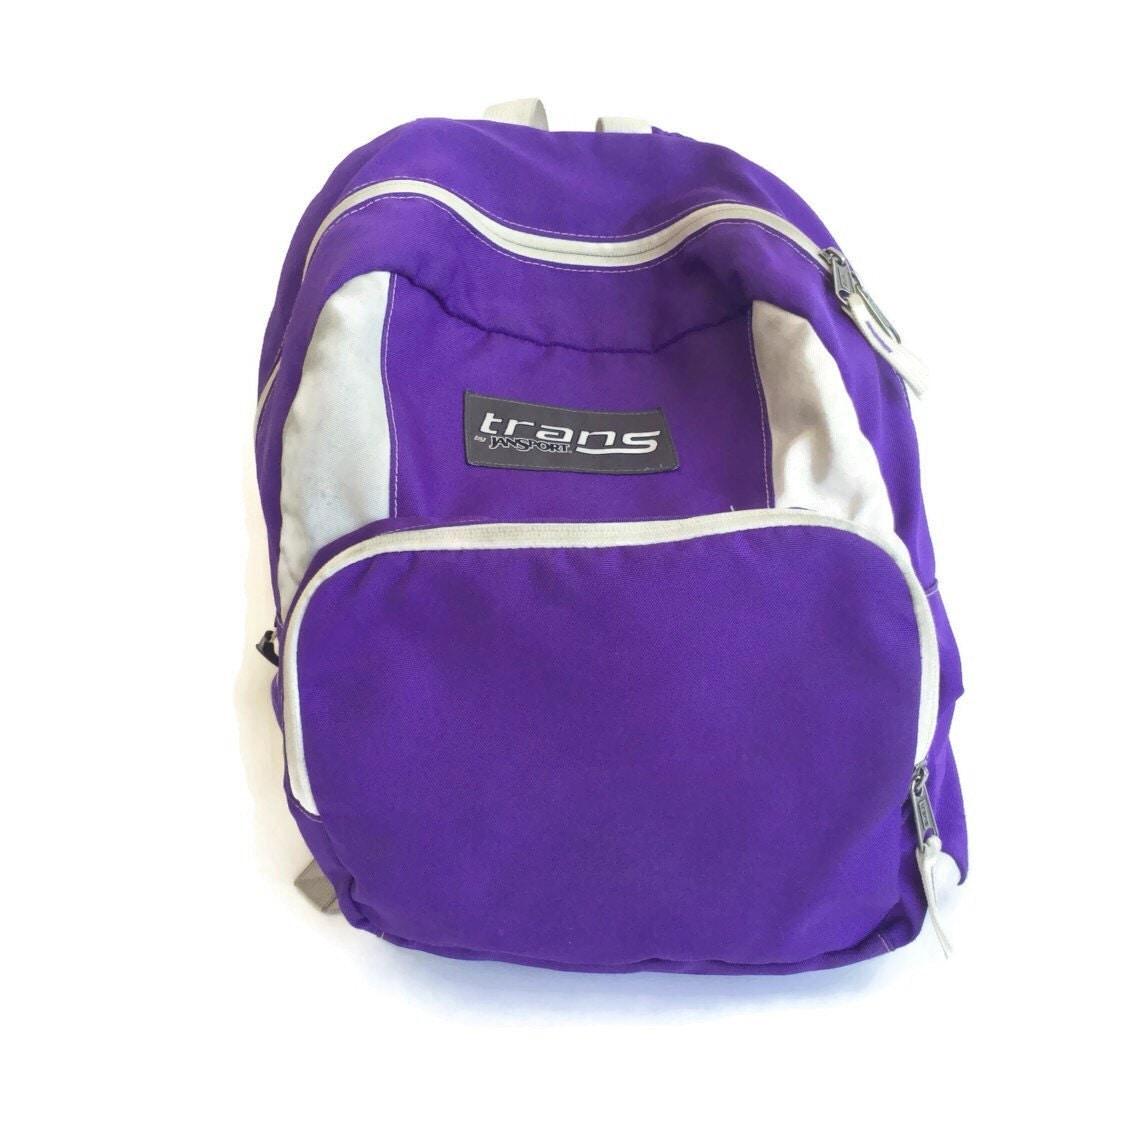 0083420b64 20% sALe 90s purple Jansport Backpack